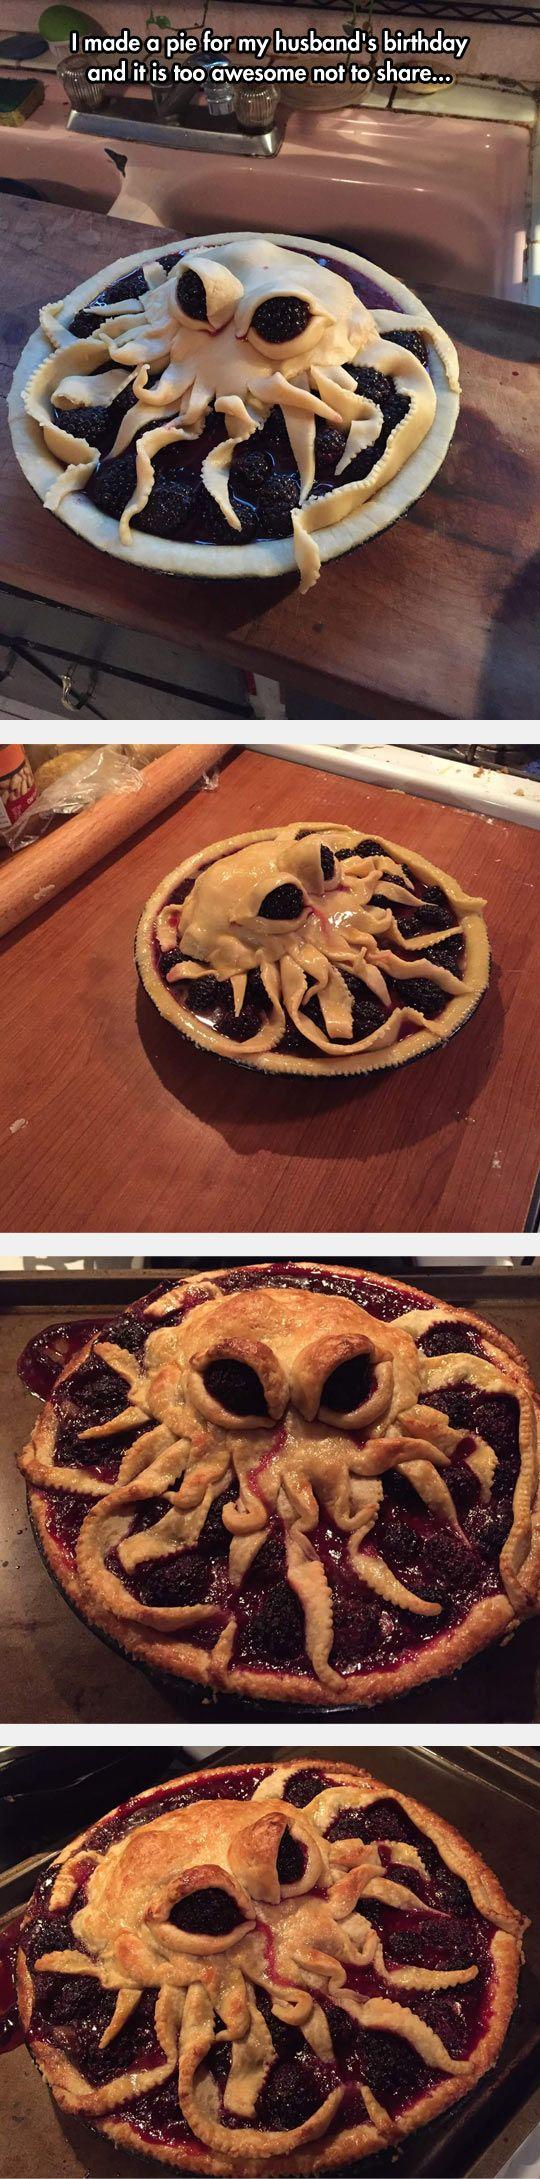 Cthulhu Pie - I need to make this! TF